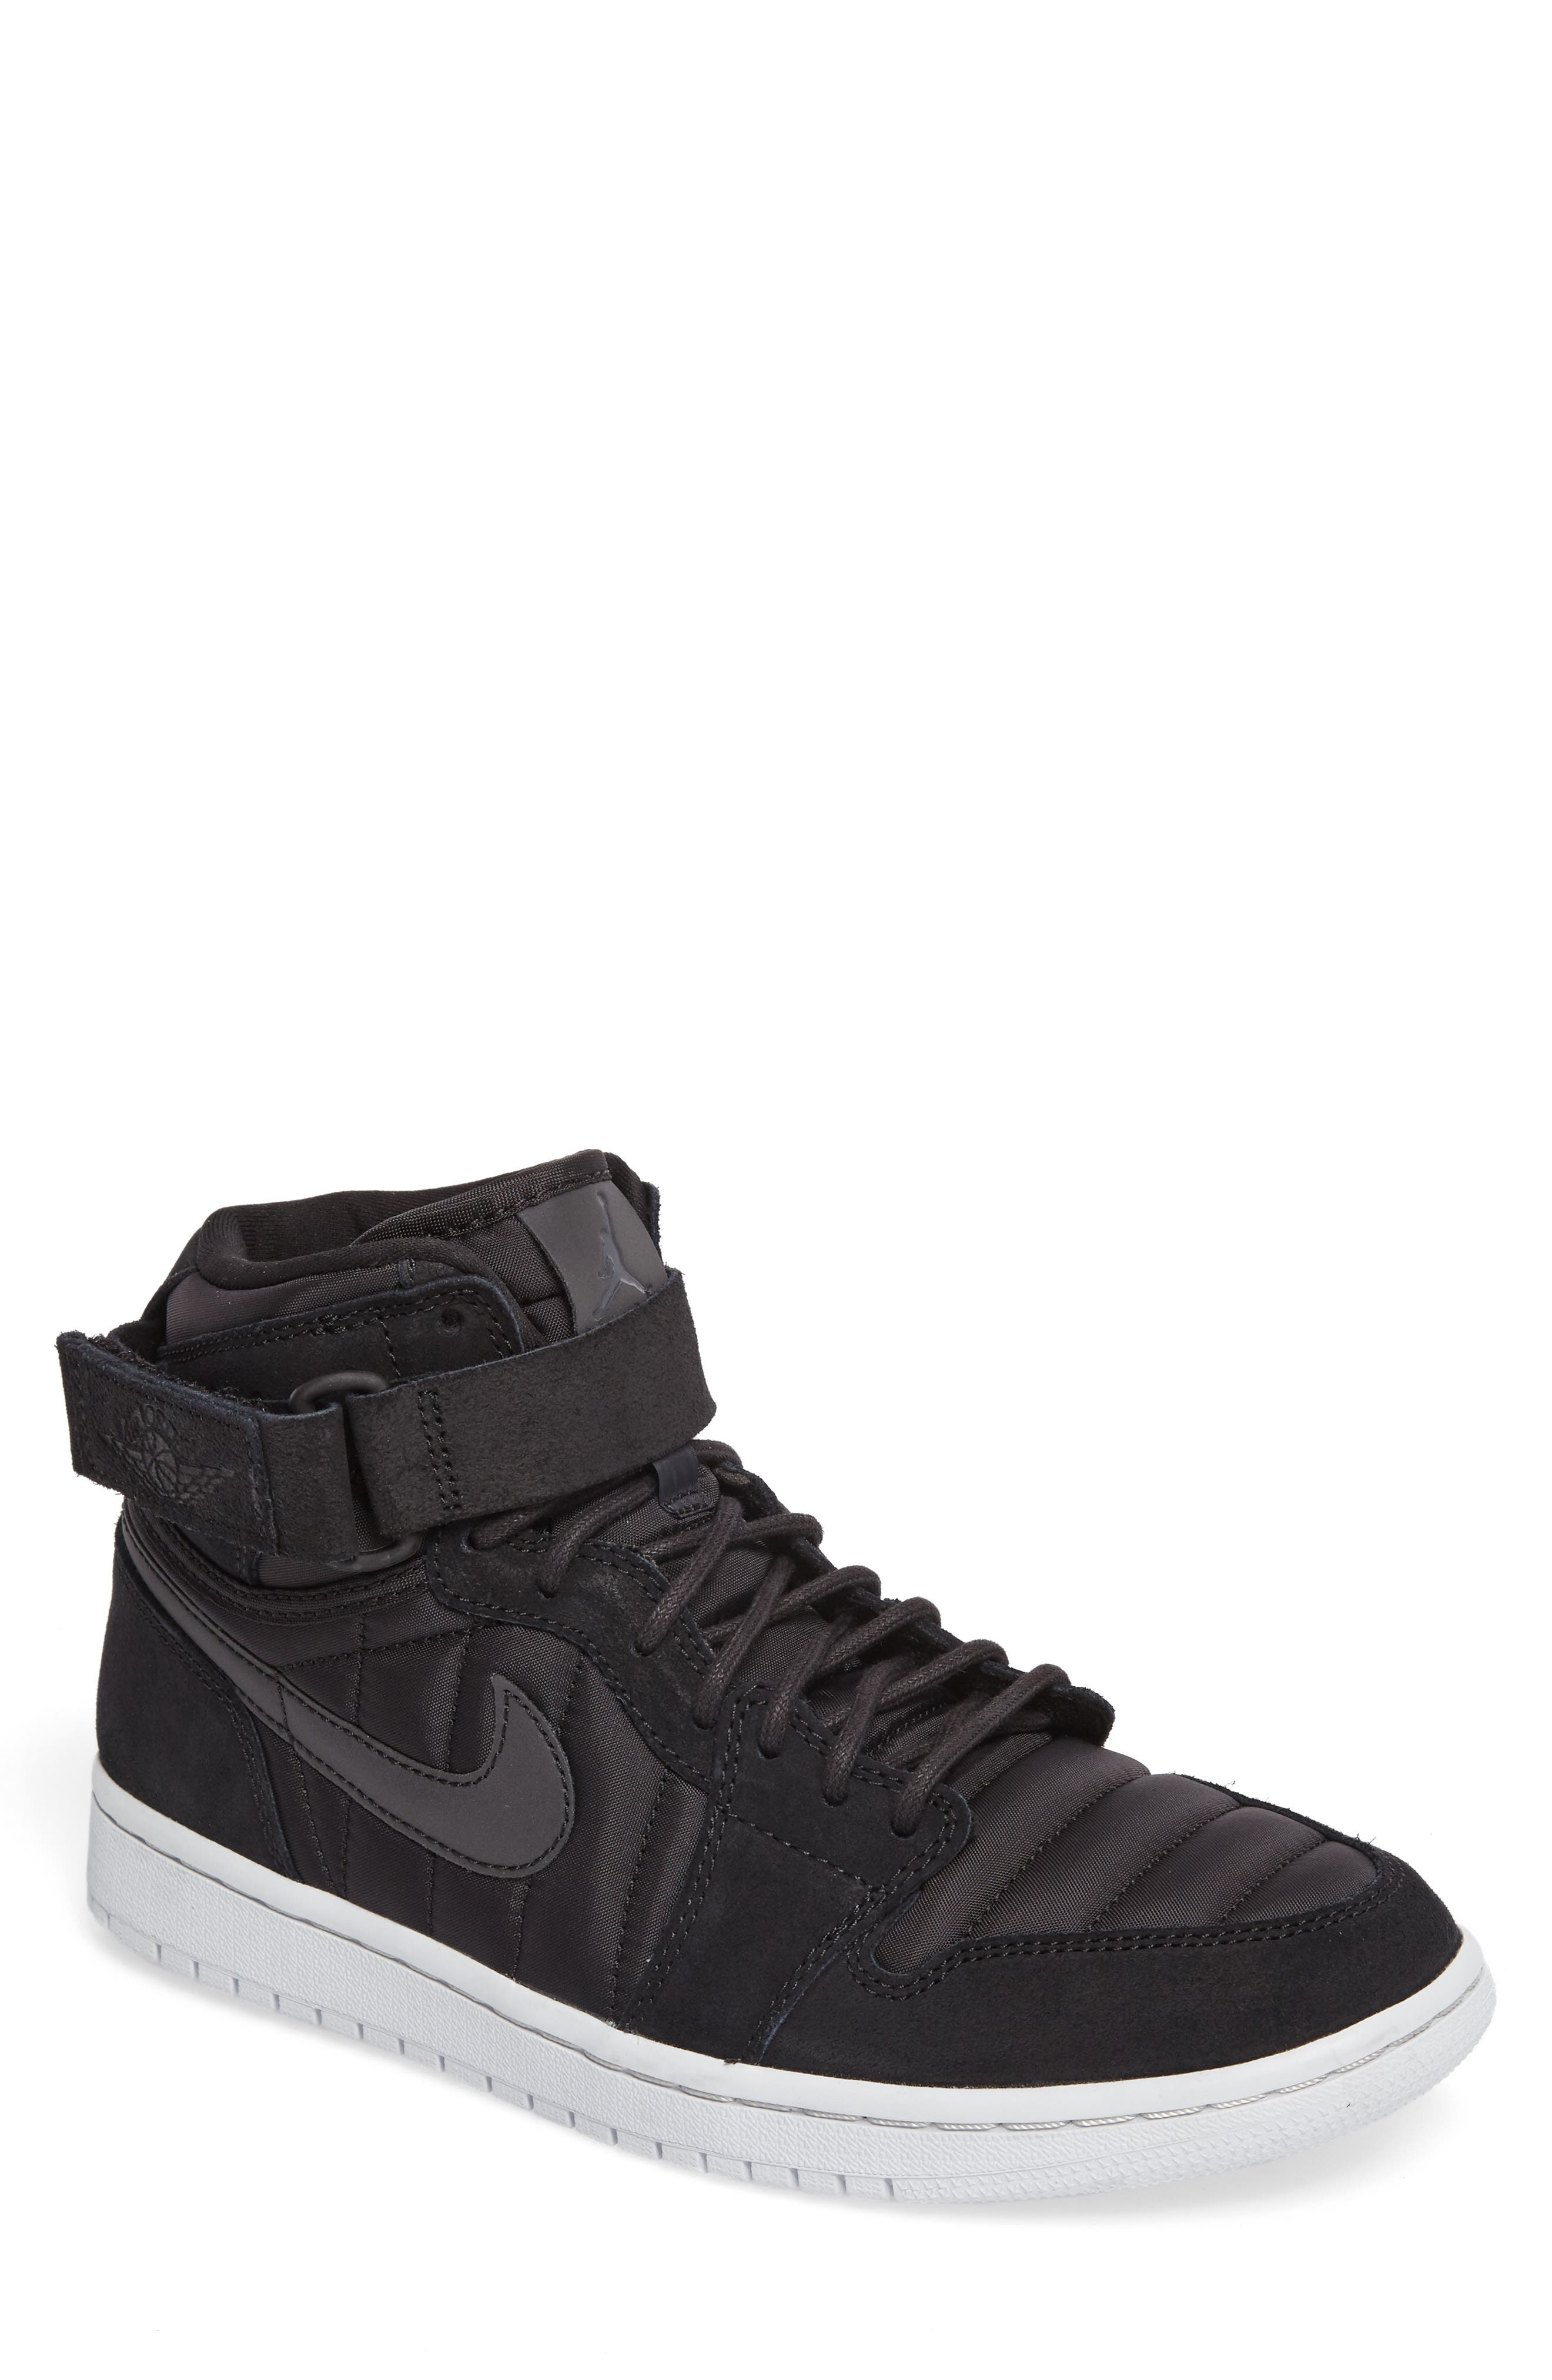 Air Jordan 1 Sneaker,                             Main thumbnail 1, color,                             004